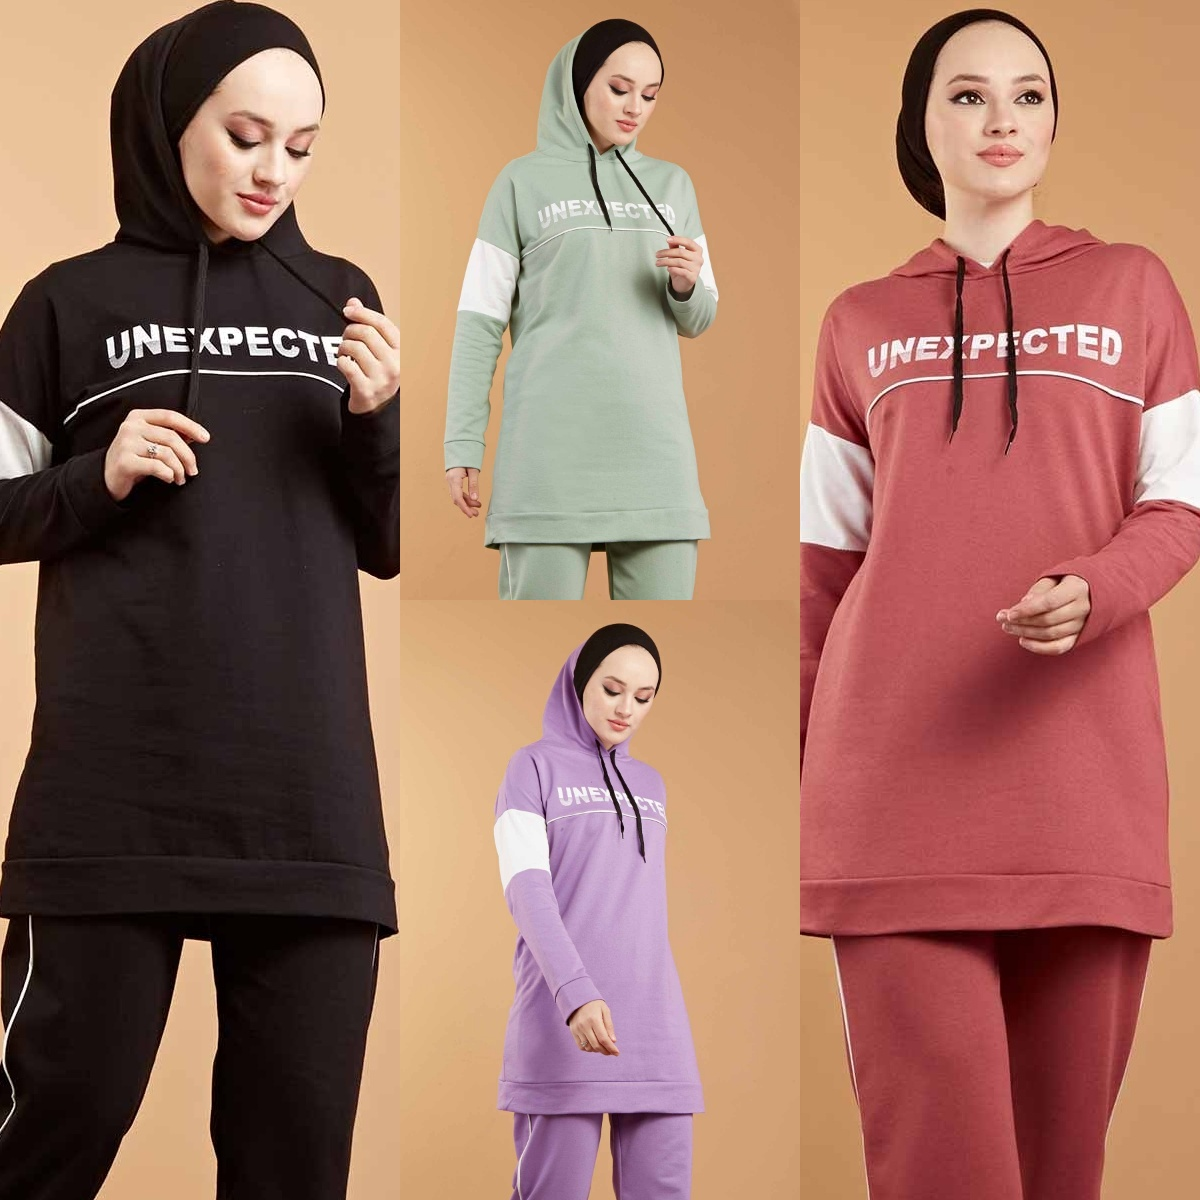 2 pcs Set Hoodies Pantsuit For Women Muslim Fashion Islamic Clothing Hooded Sport Tracksuit Casual Sweatshirt Winter Warm Fleece